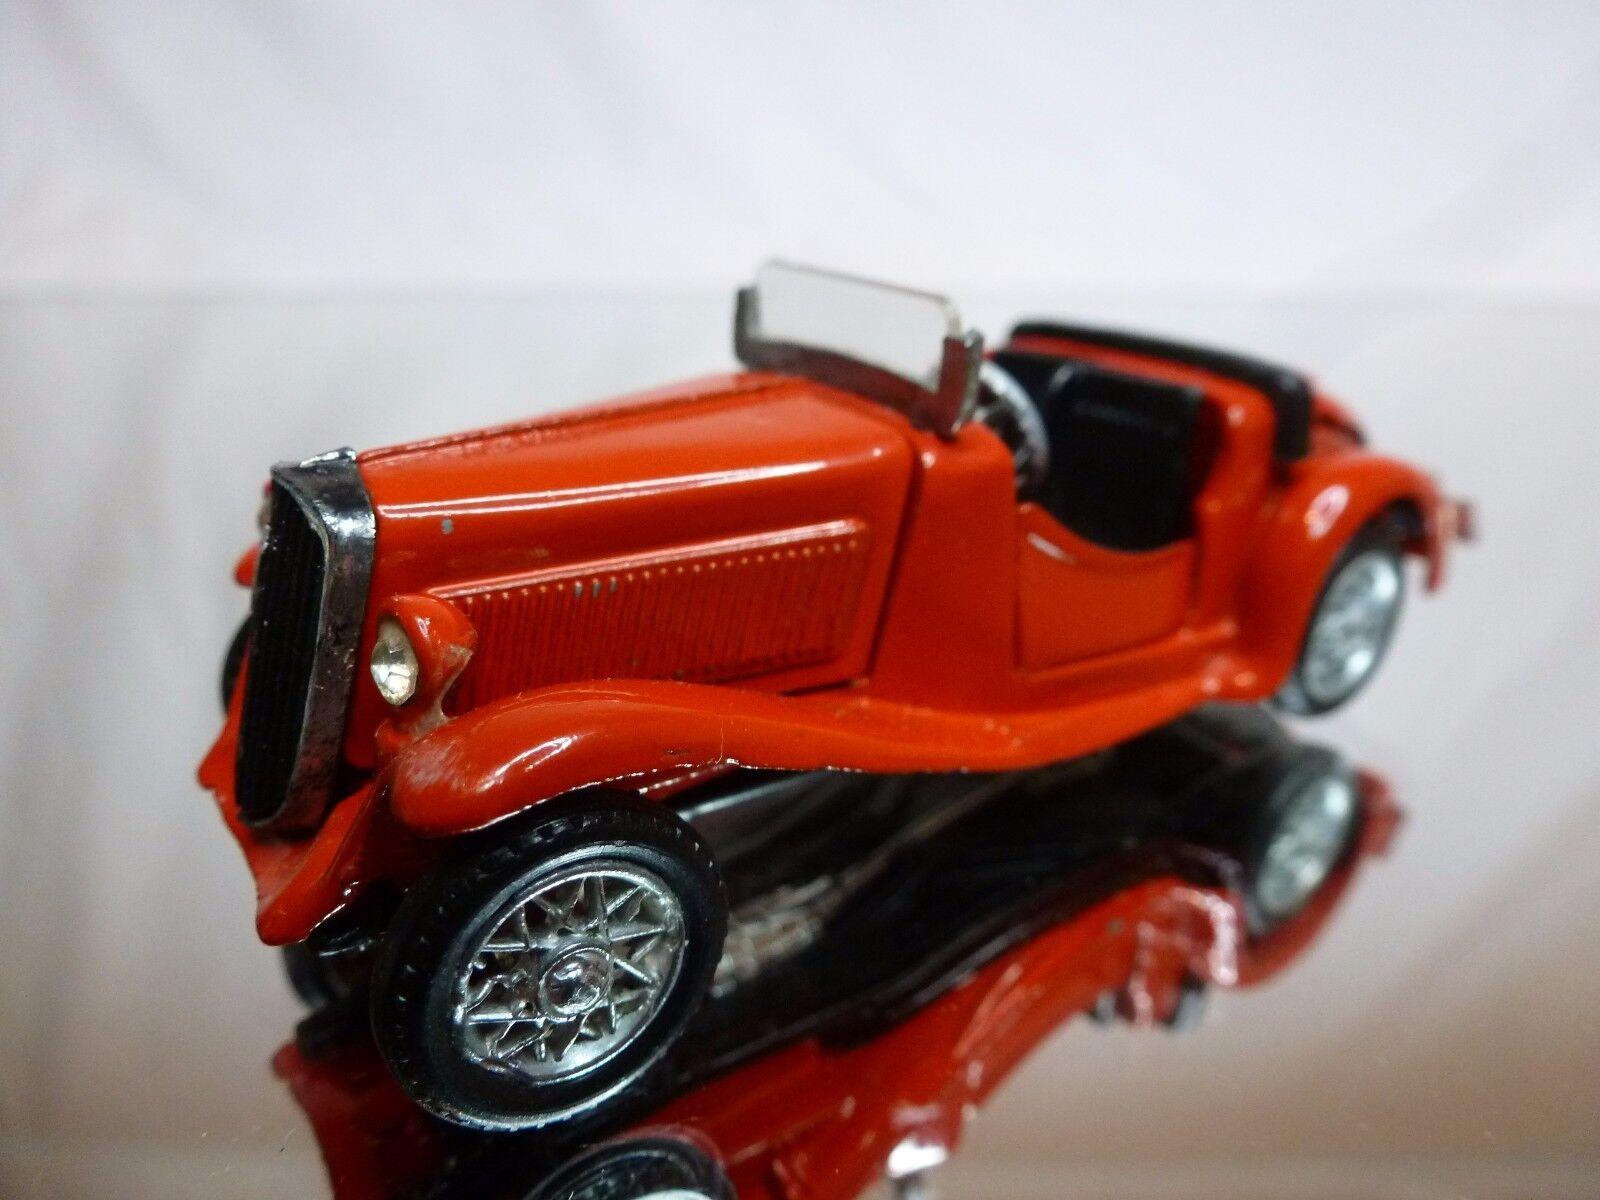 METAL KIT (built) FIAT 508 BALILLA CABRIOLET - RED 1 43 - GOOD CONDITION